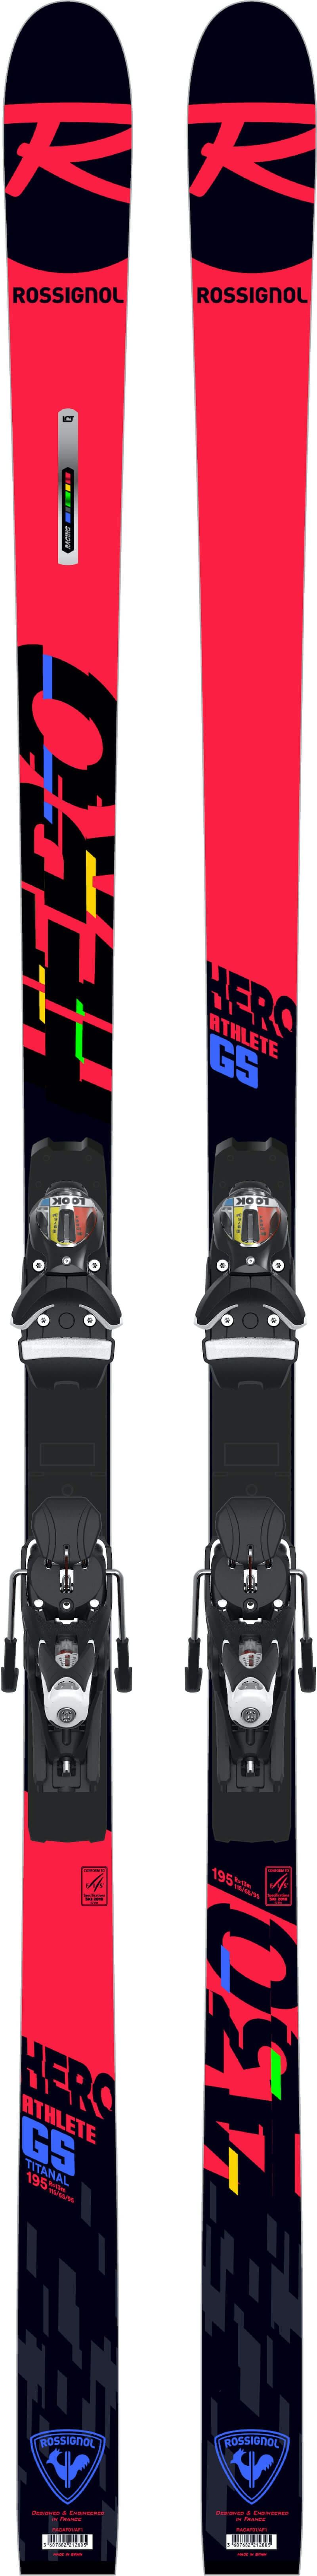 ROSSIGNOL HERO ATHLETE GS(R22)/SPX12 RBI - 175 cm